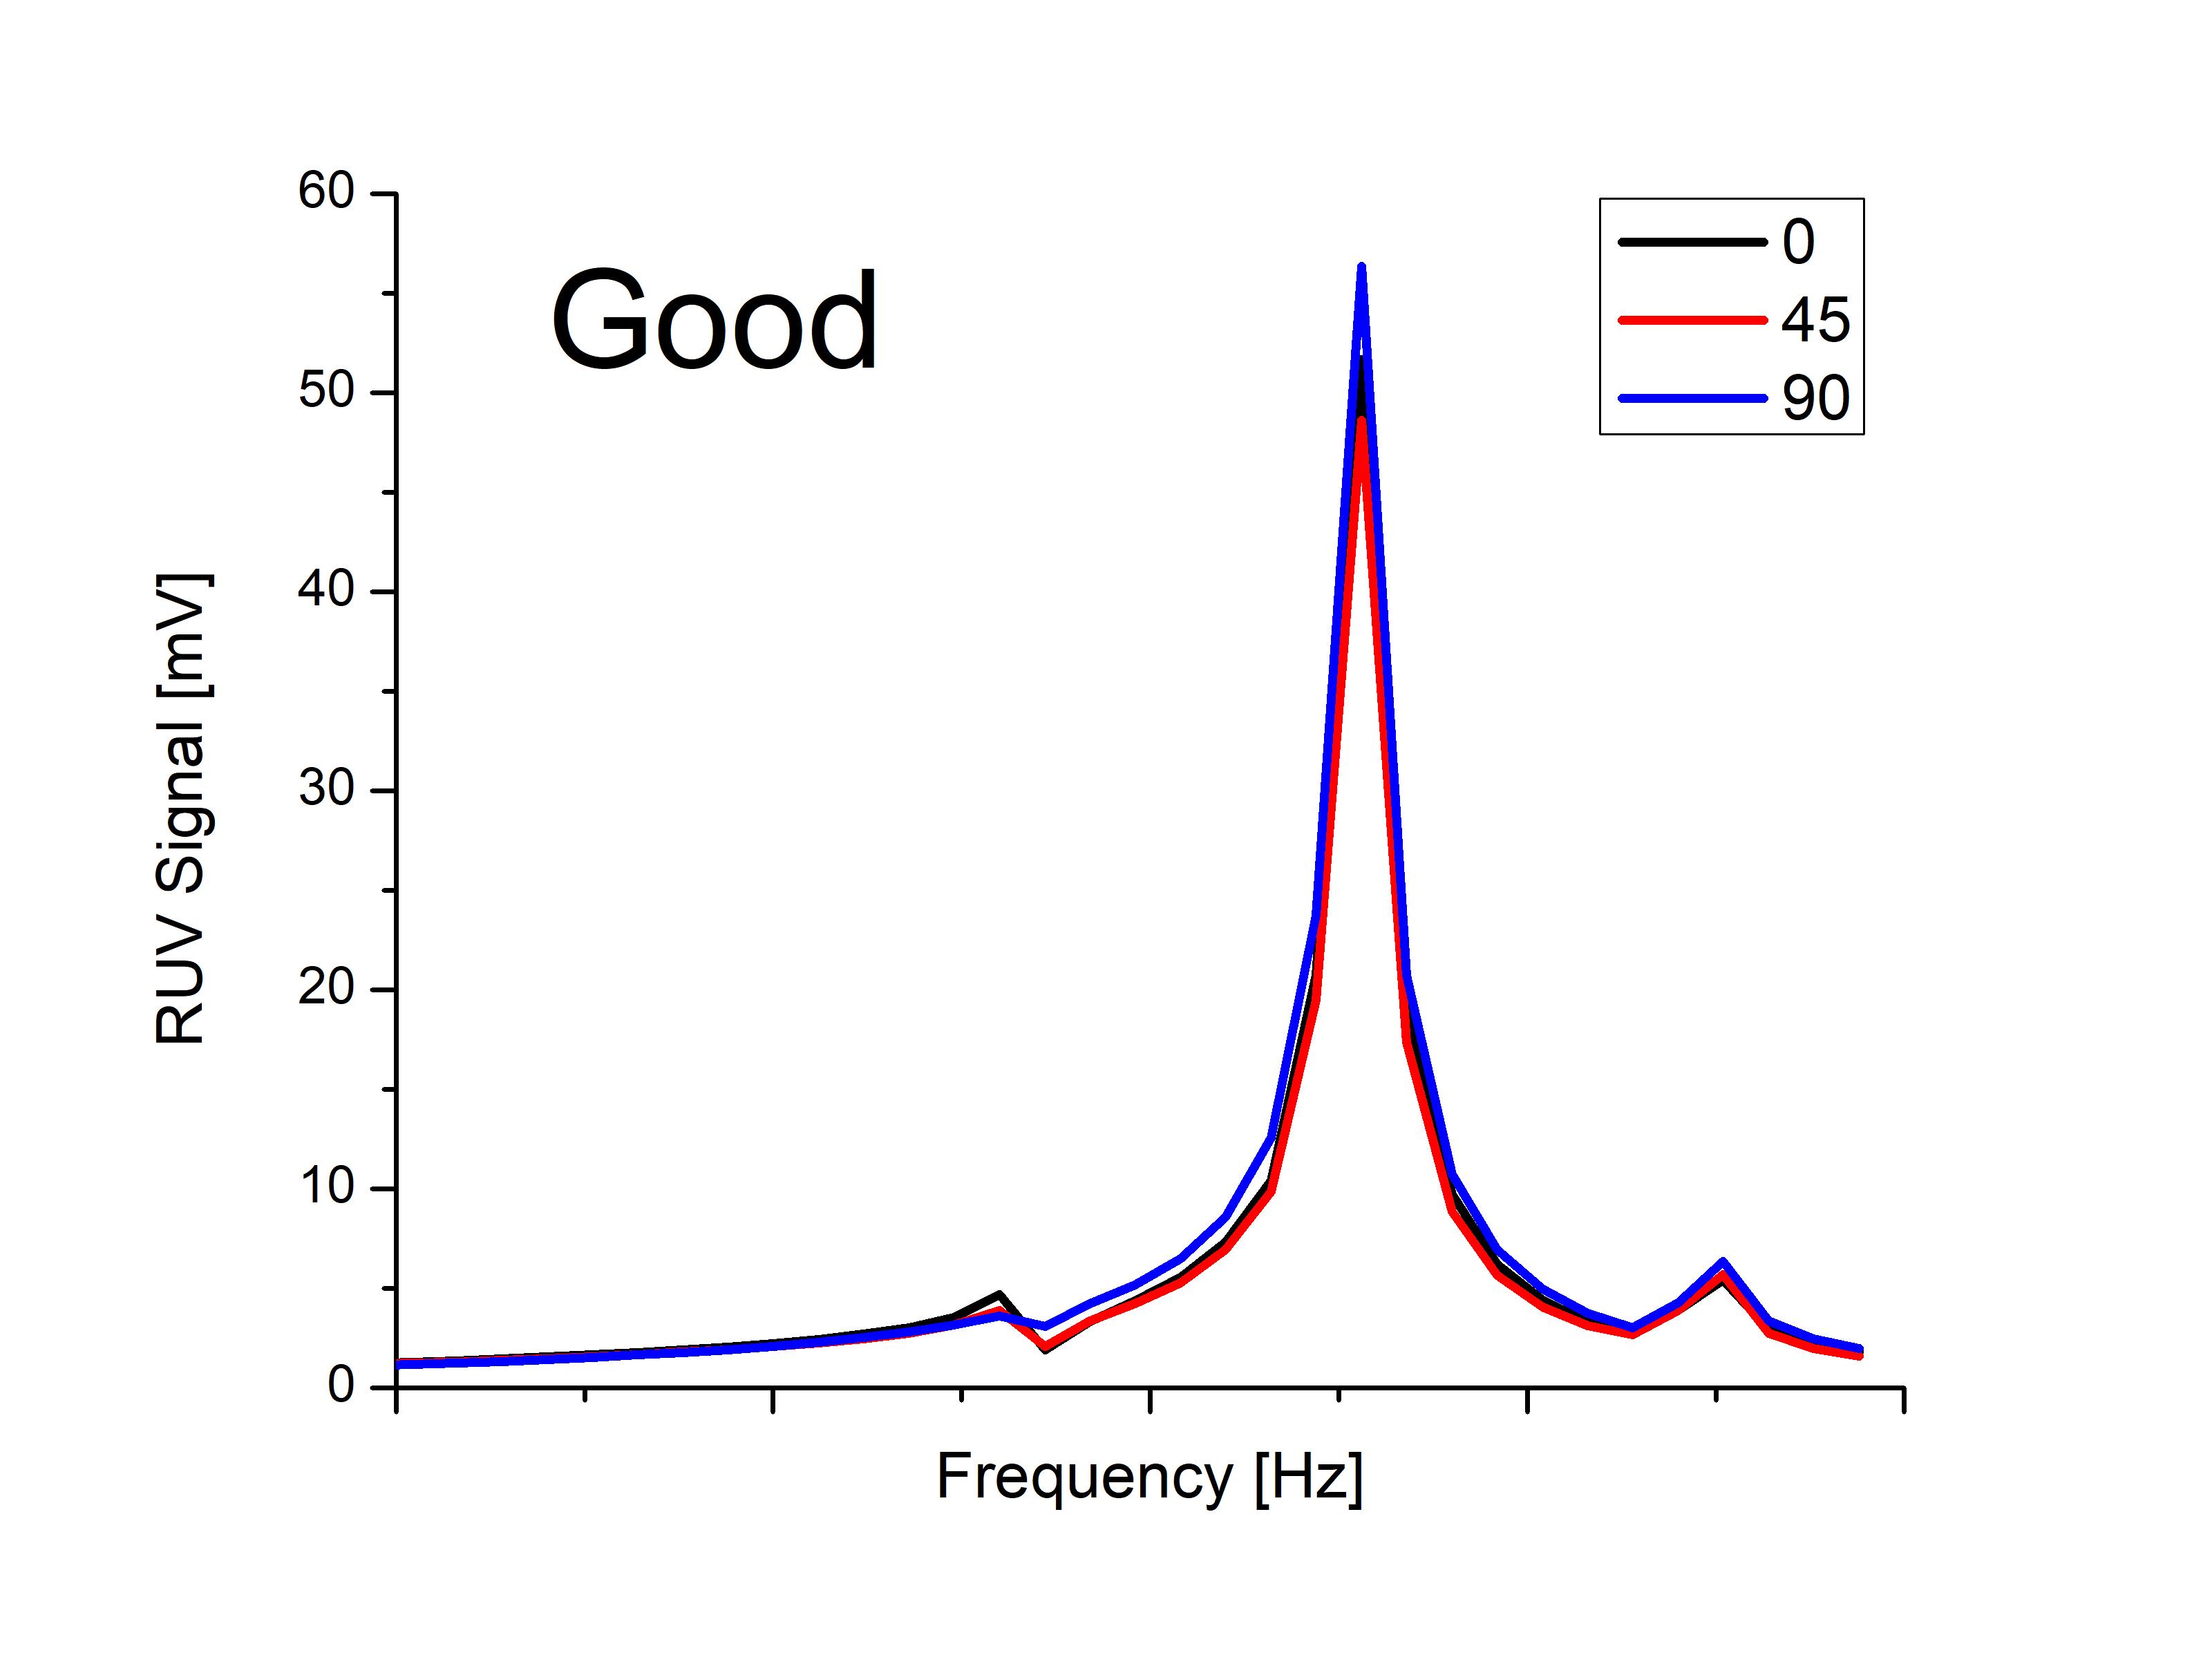 Figure 1: RUV signatures of good samples.